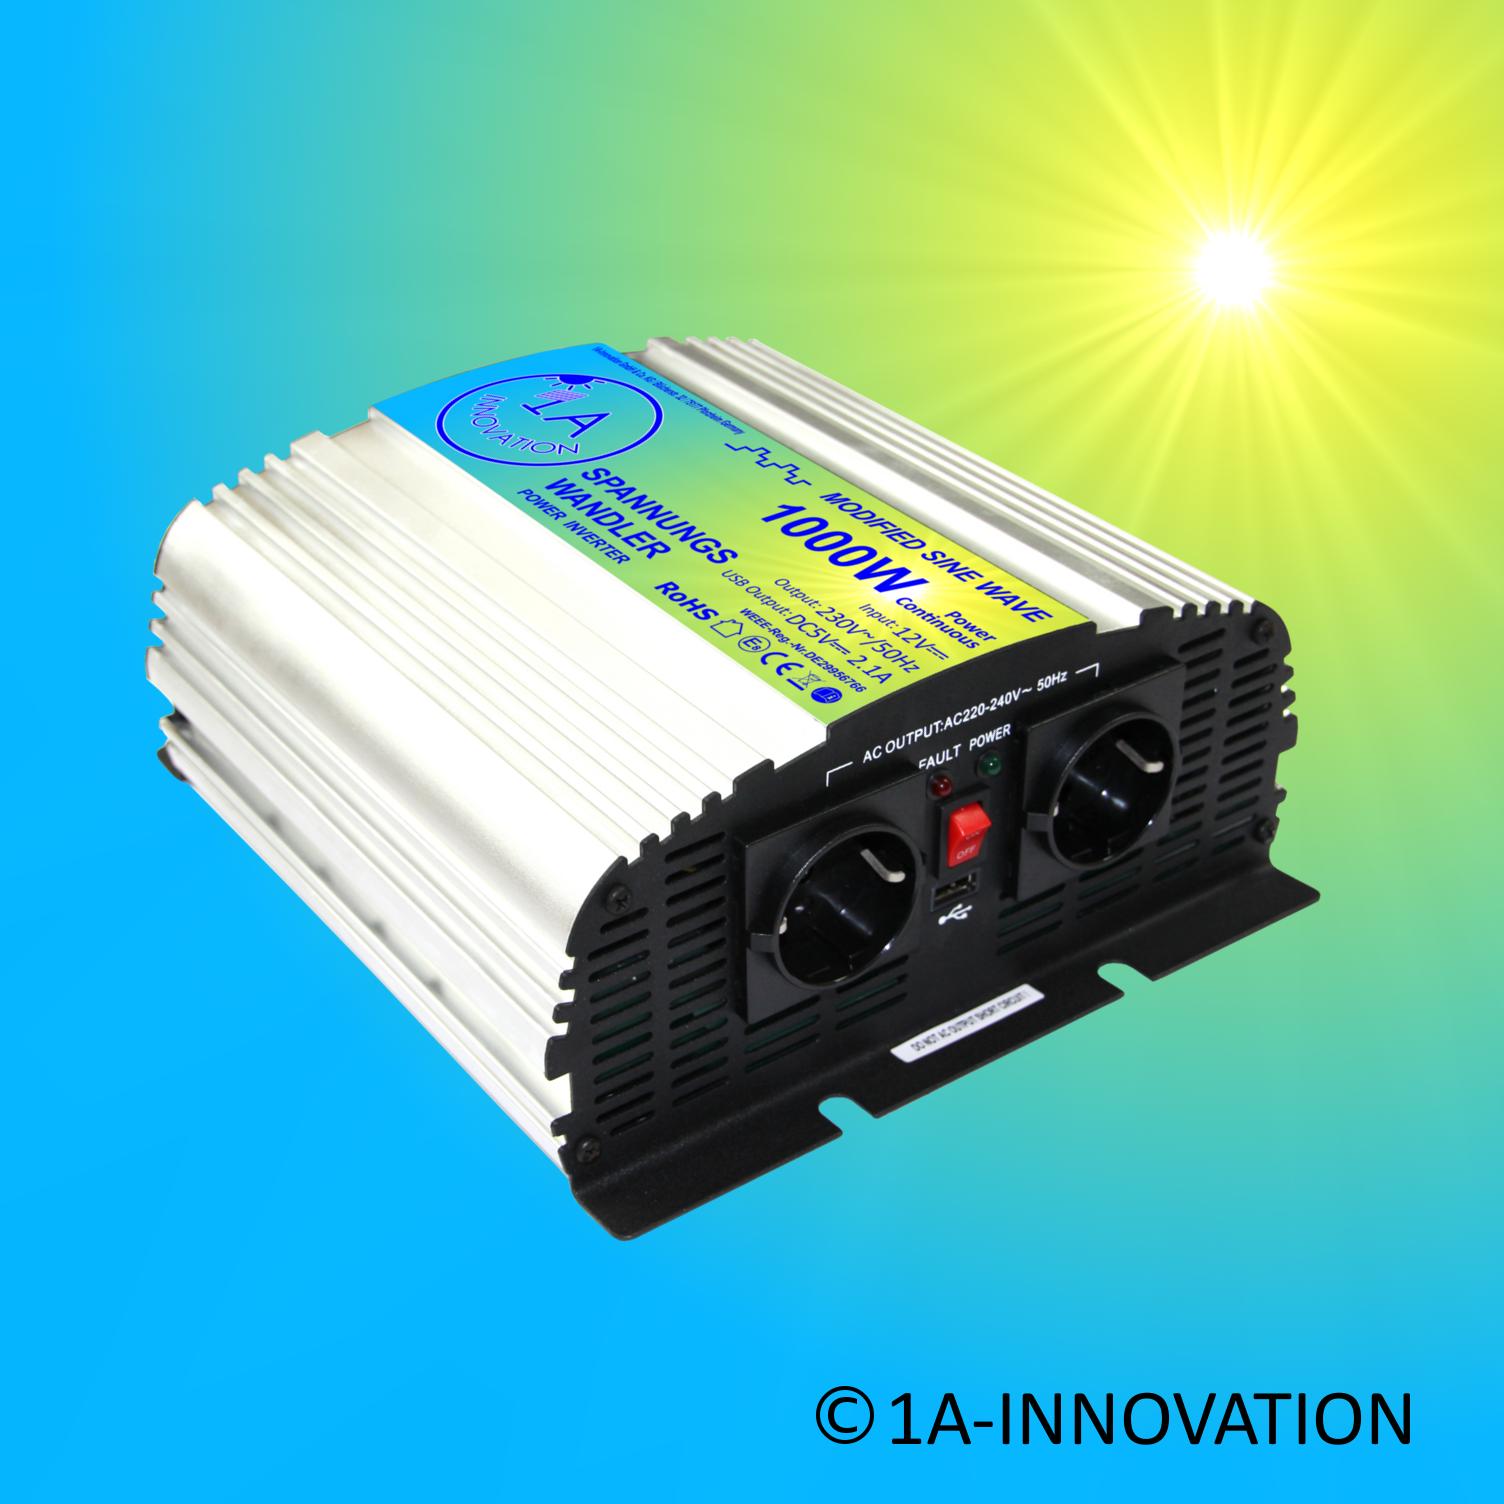 Photovoltaik-hausanlagen 1000w Solaranlage Komplettpaket 220v 4x Akku 280ah Solarpanel 2000w Watt 24v